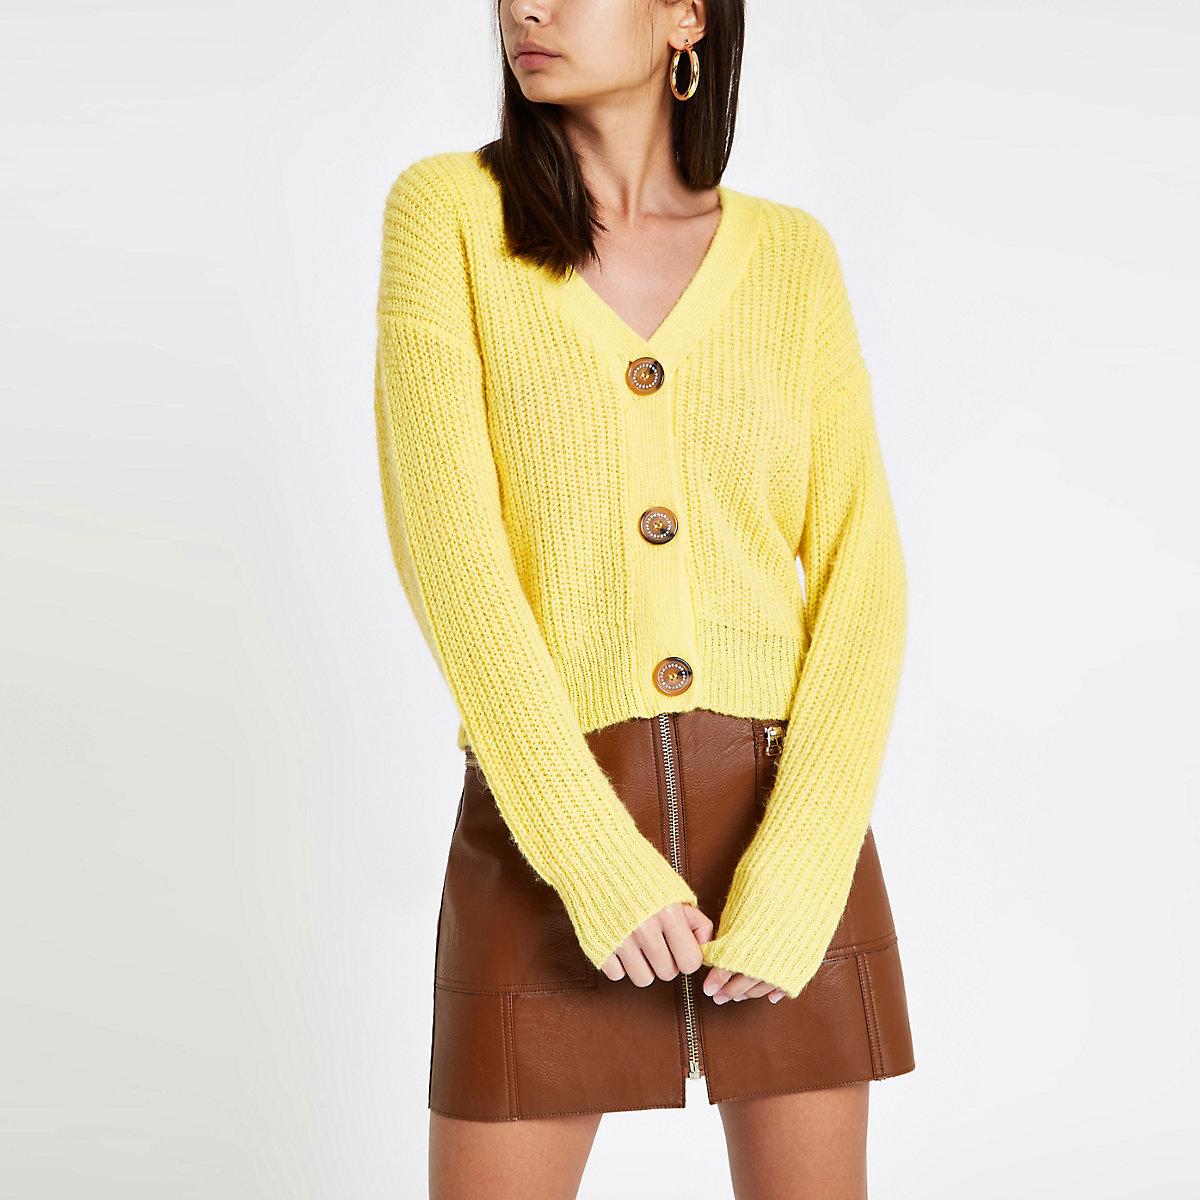 Yellow V neck rhinestone button cardigan